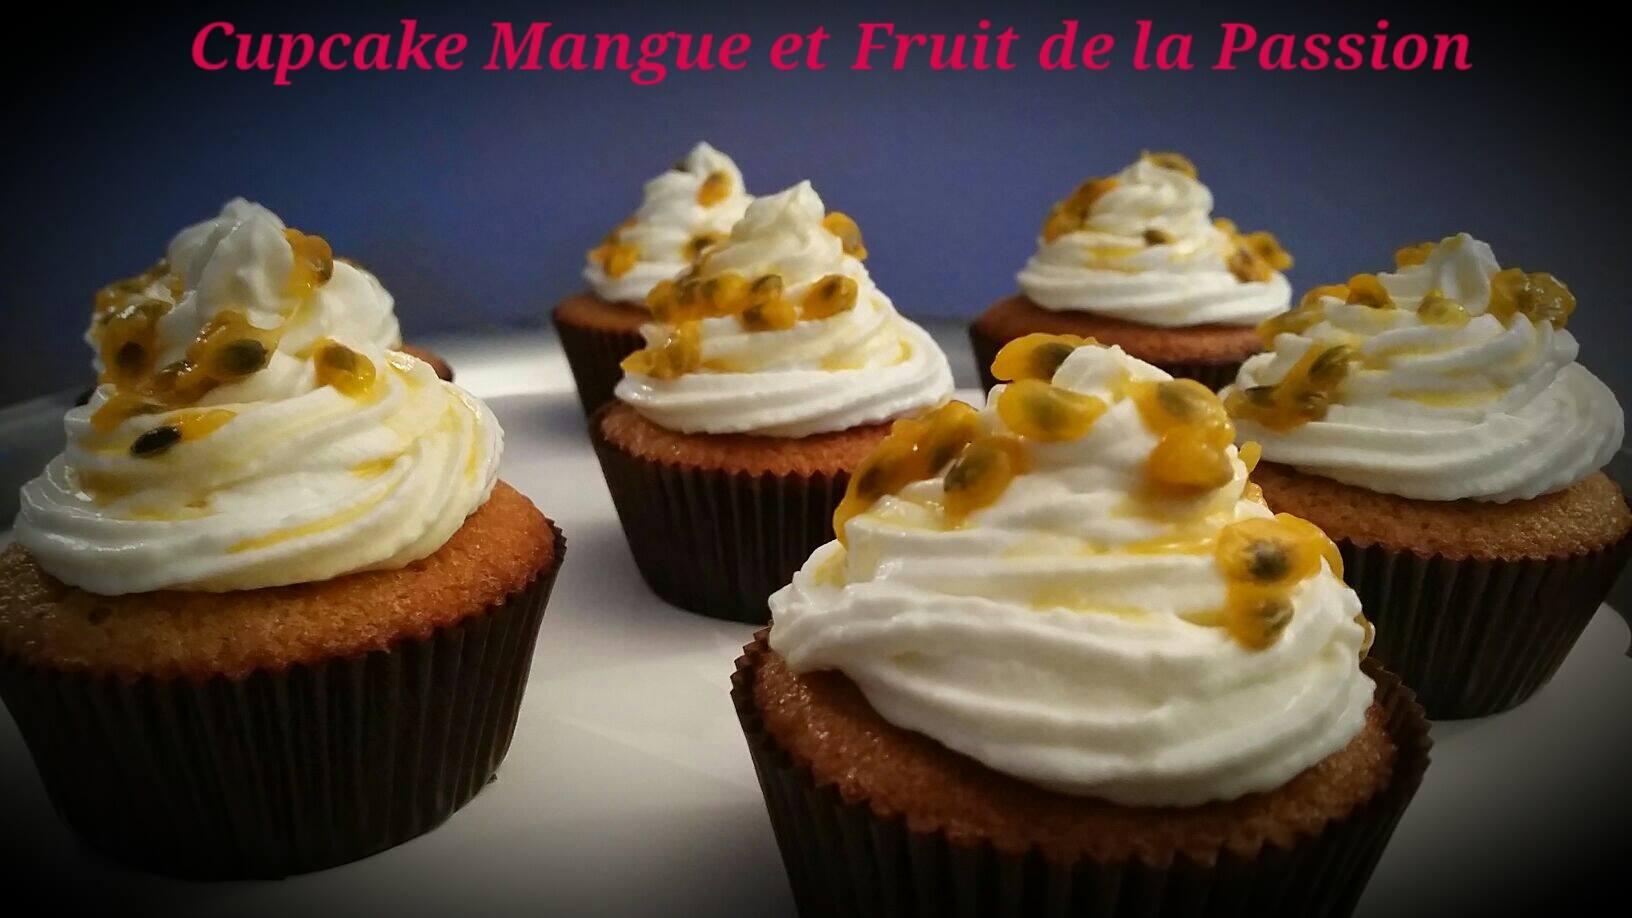 cupcake mangue passion